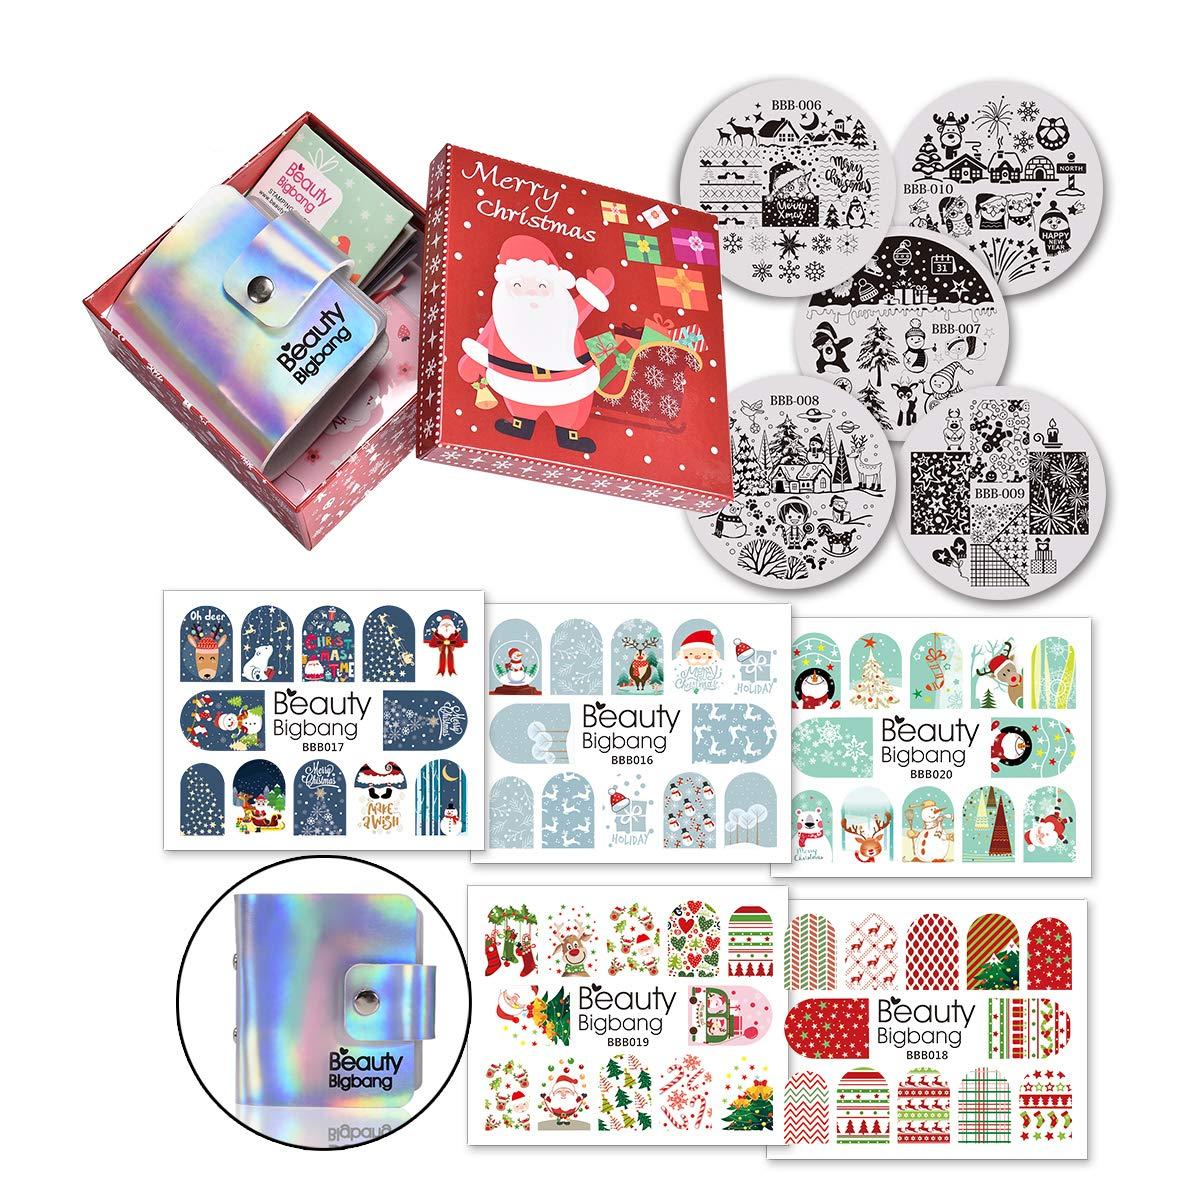 BEAUTYBIGBANG 5PCS Christmas Nail Stamping Plate Image Template + 5PCS Nail Sticker + Holo Holder Organizer Nail Design Manicure Santa Claus Snowman